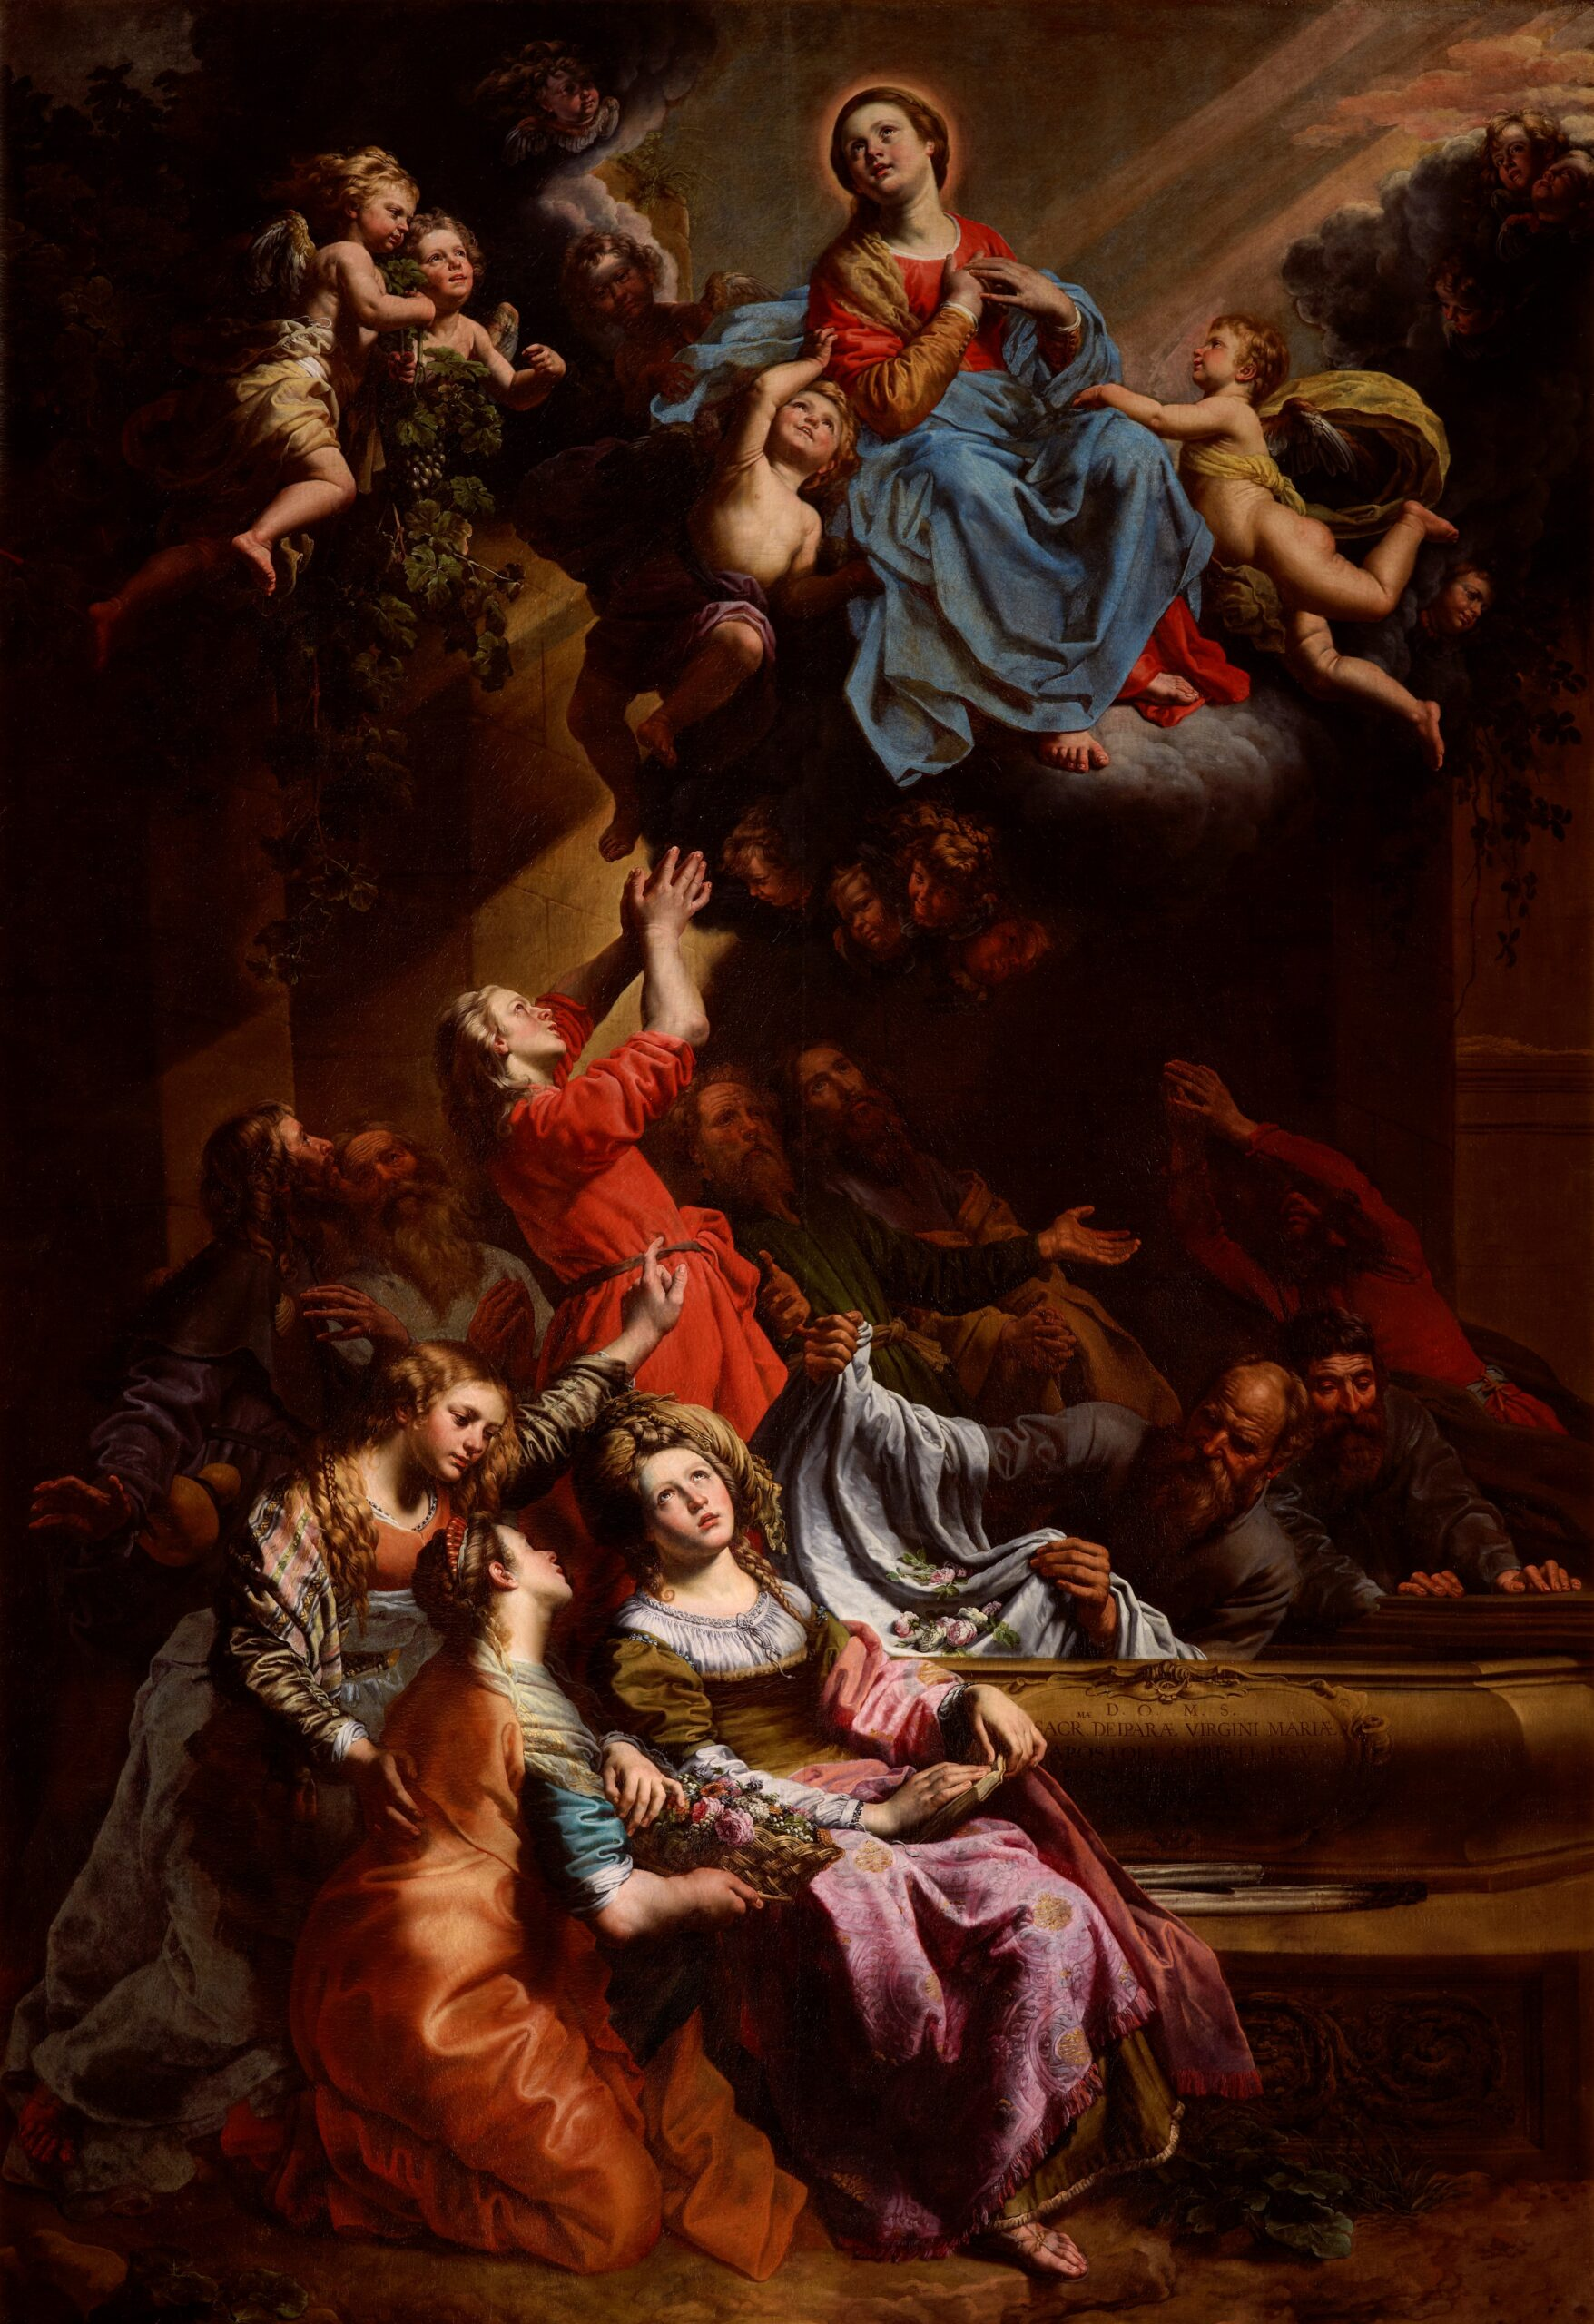 Theodoor van Loon (ca.1581-1667), The Assumption of the Virgin Mary Royal Museums of Fine Arts of Belgium in Brussels